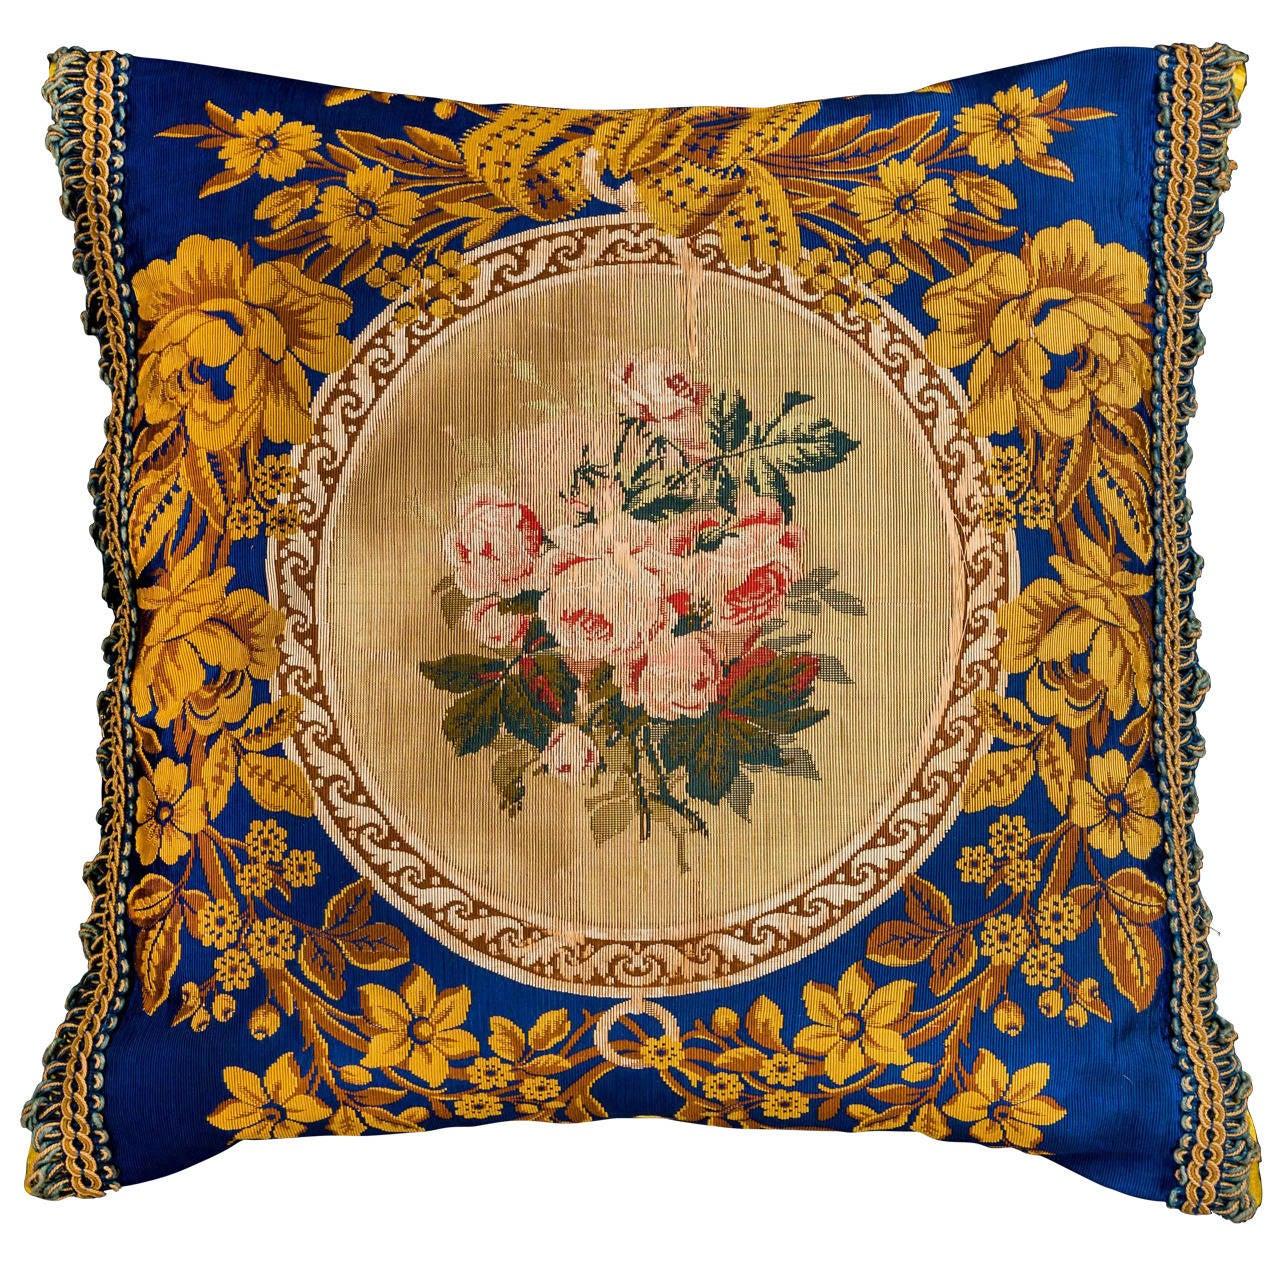 Cushion: Mid-19th Century, Silk. Machine Embroidered